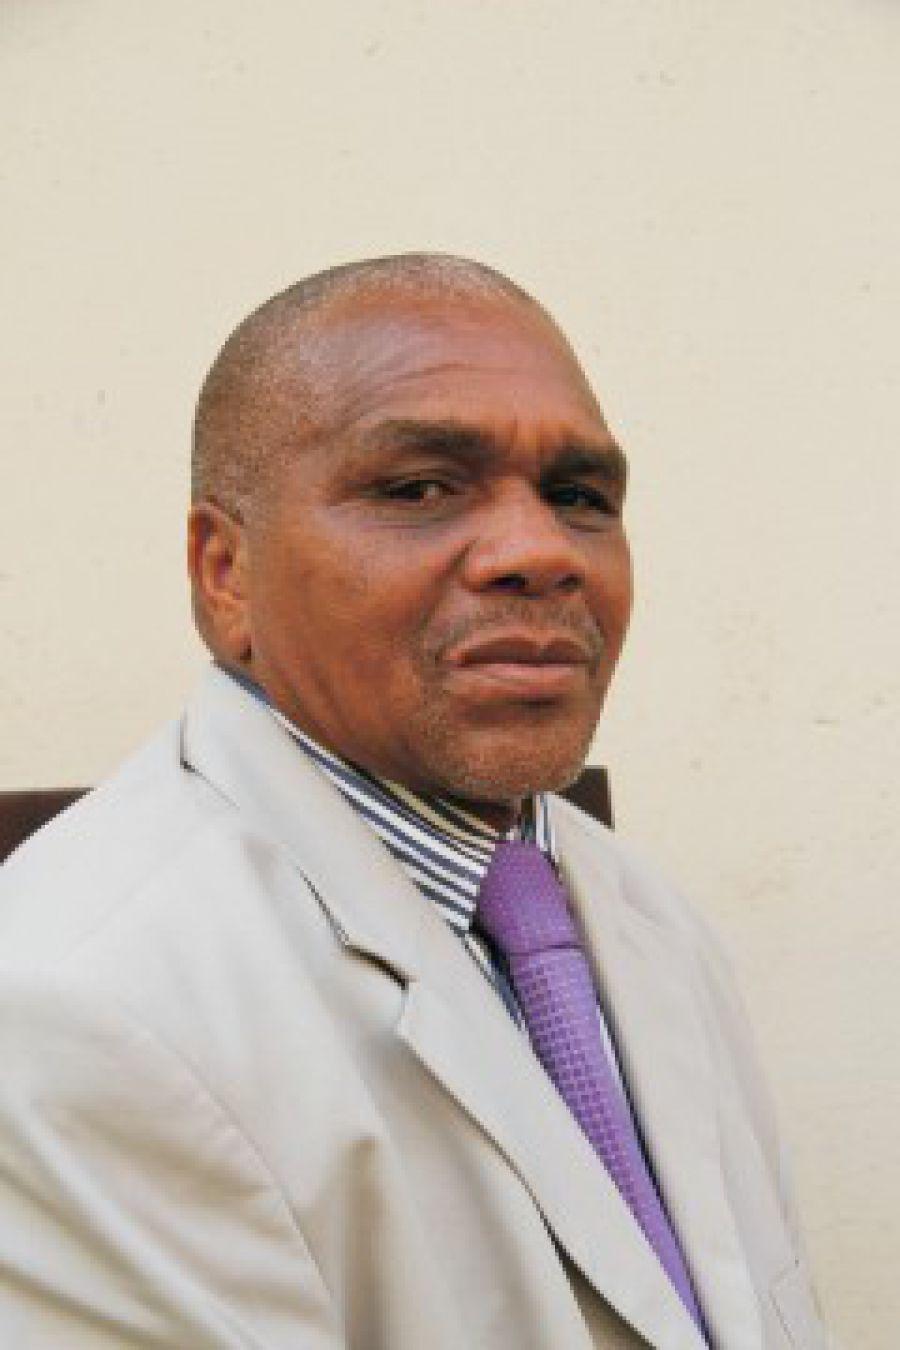 Harris Ncube